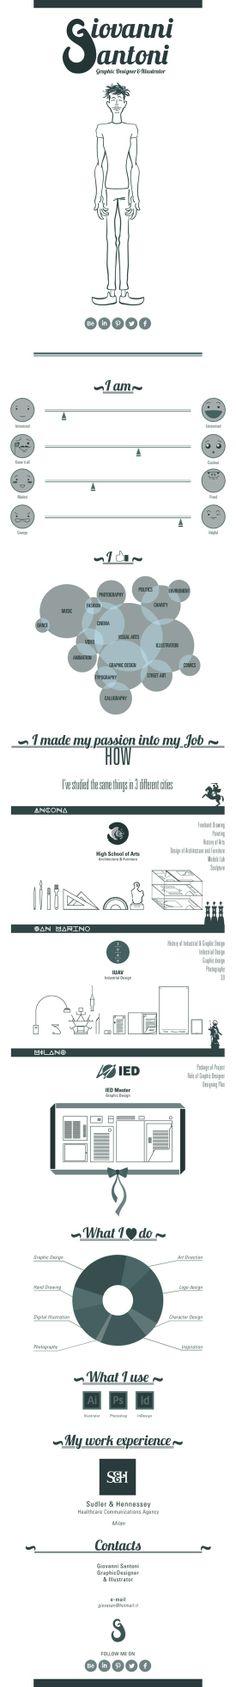 Erin Maioriello 2013 Resume/CV on Behance Resume Design